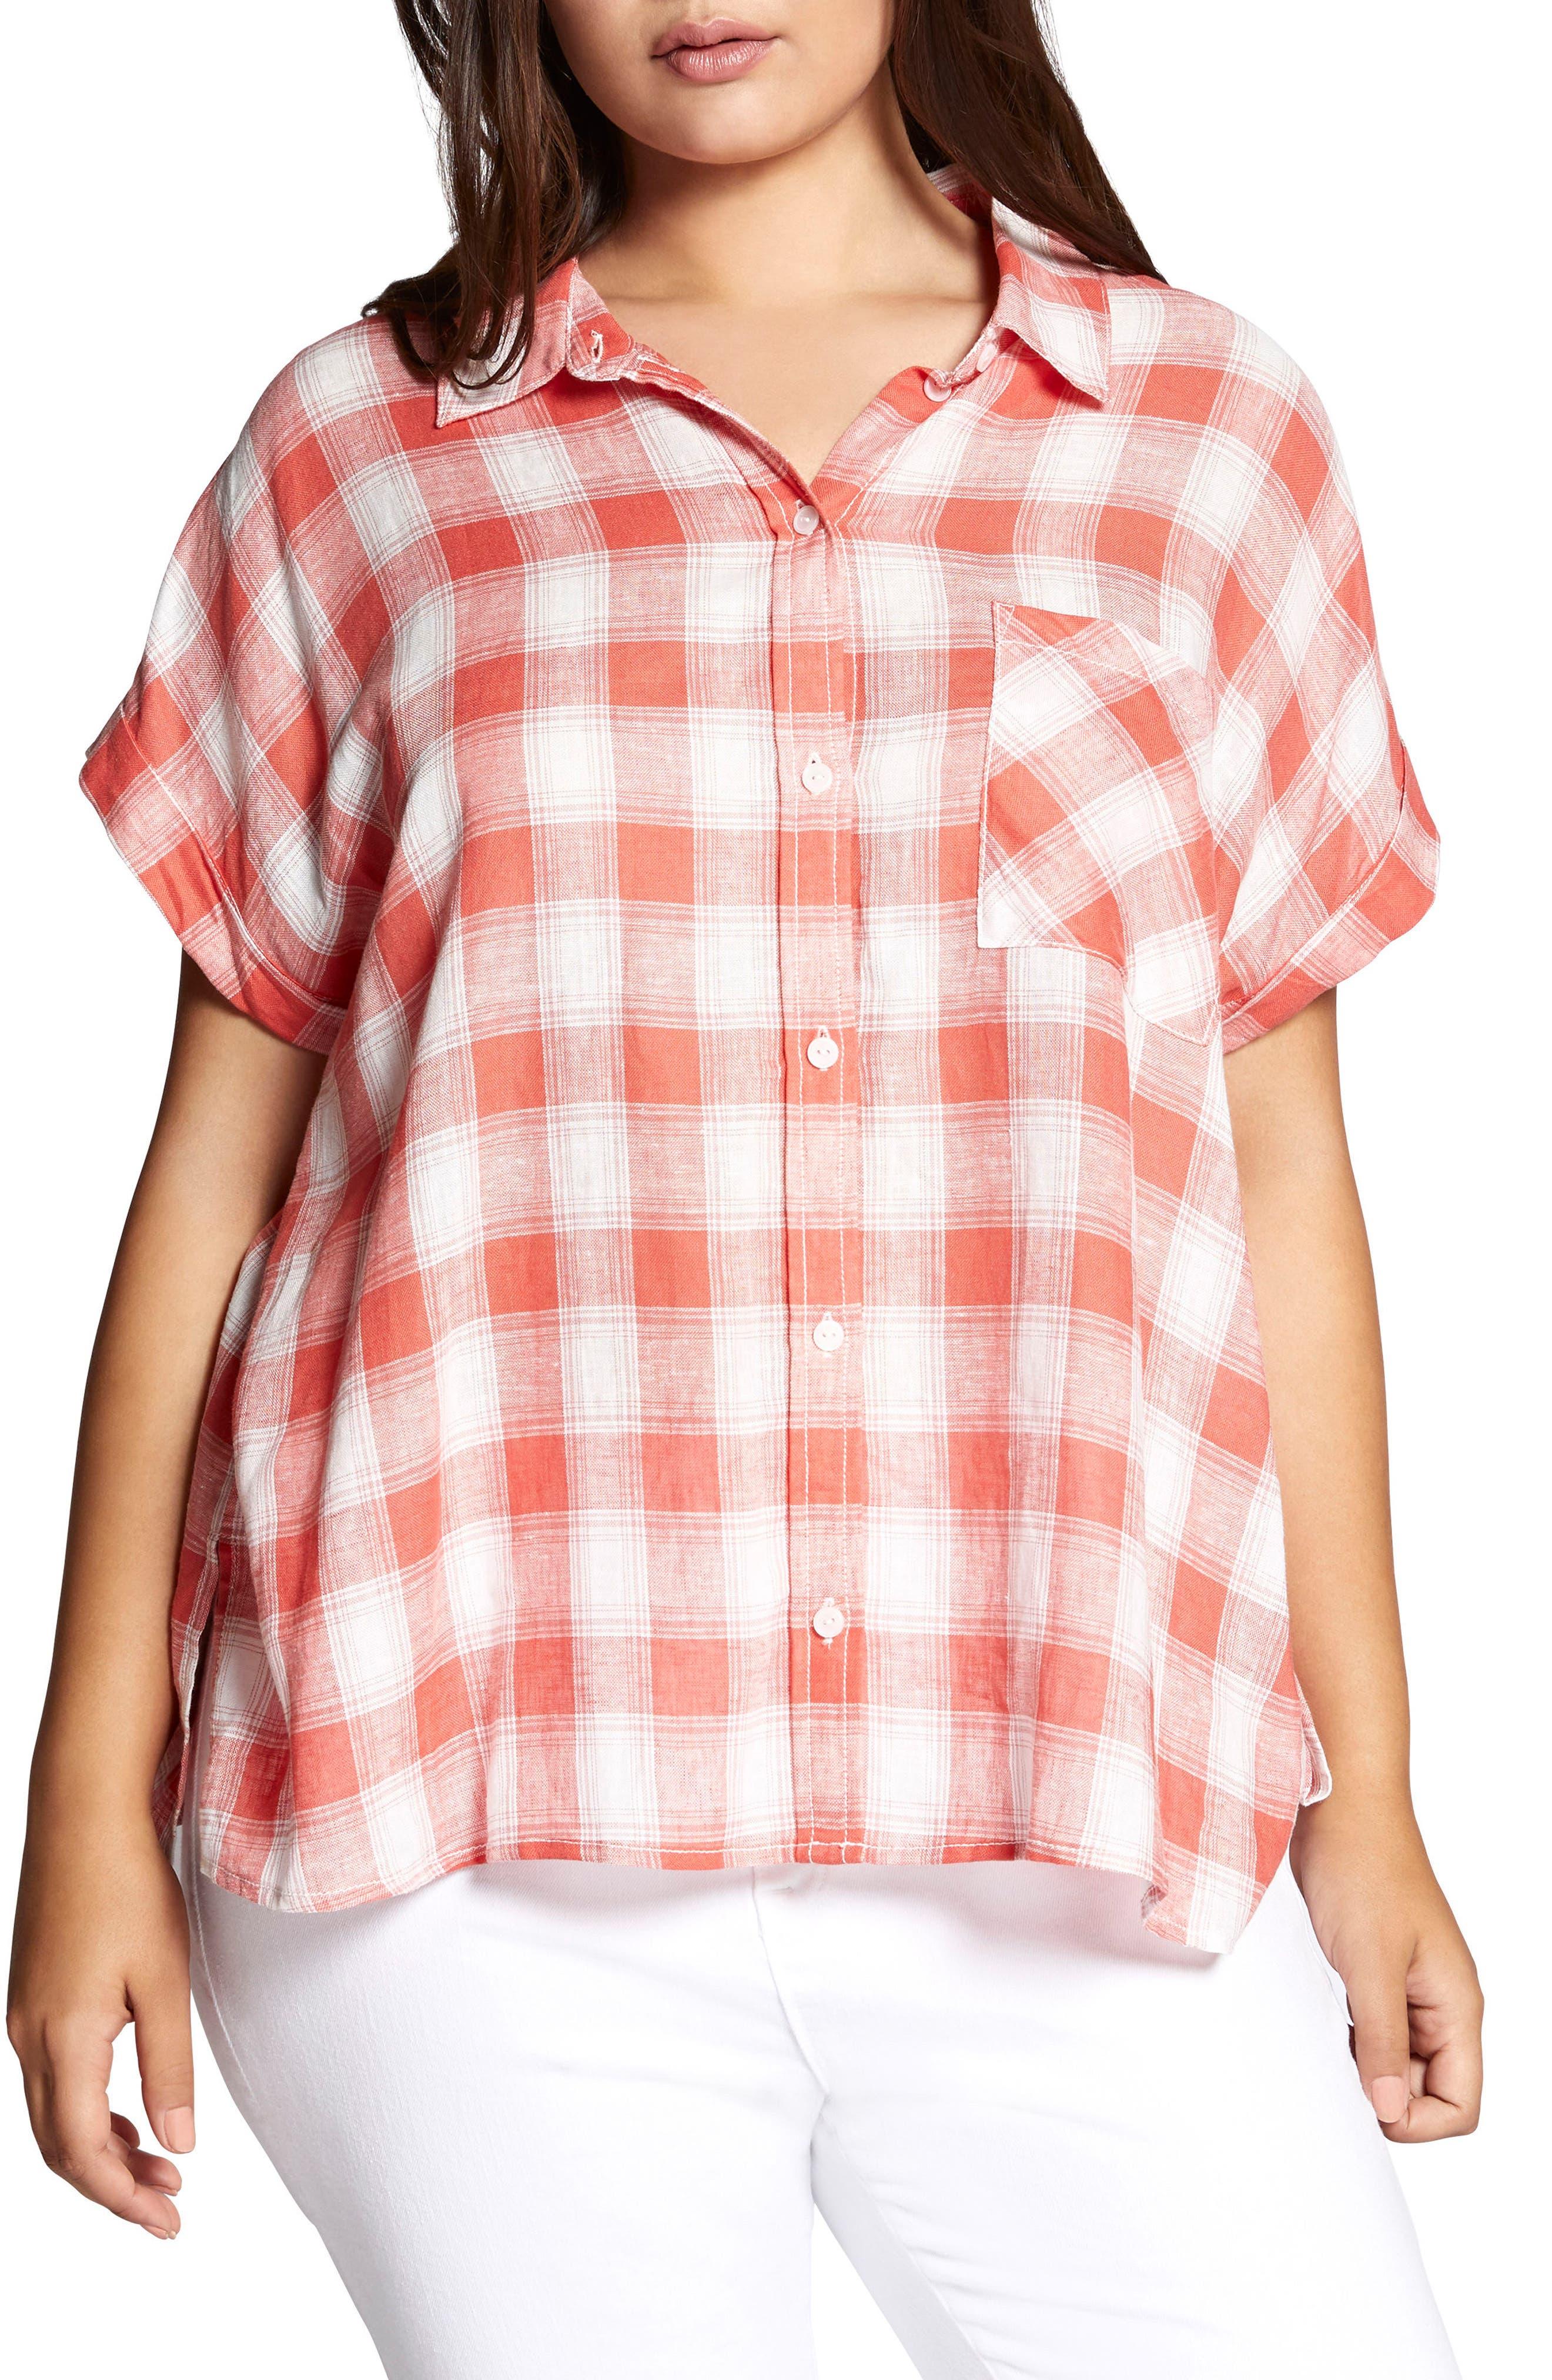 Mod Check Boyfriend Shirt,                             Main thumbnail 1, color,                             Chili Plaid